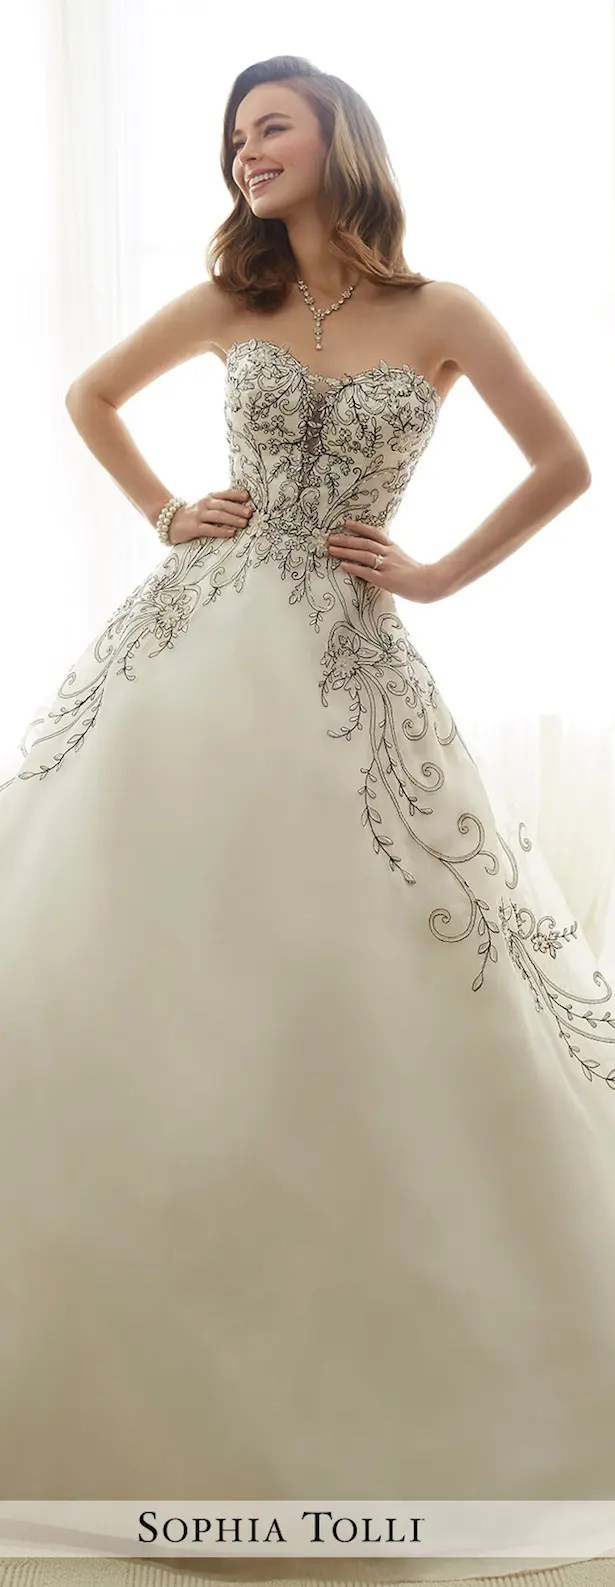 Sophia Tolli Spring 2017 Wedding Dress Collection - crazyforus